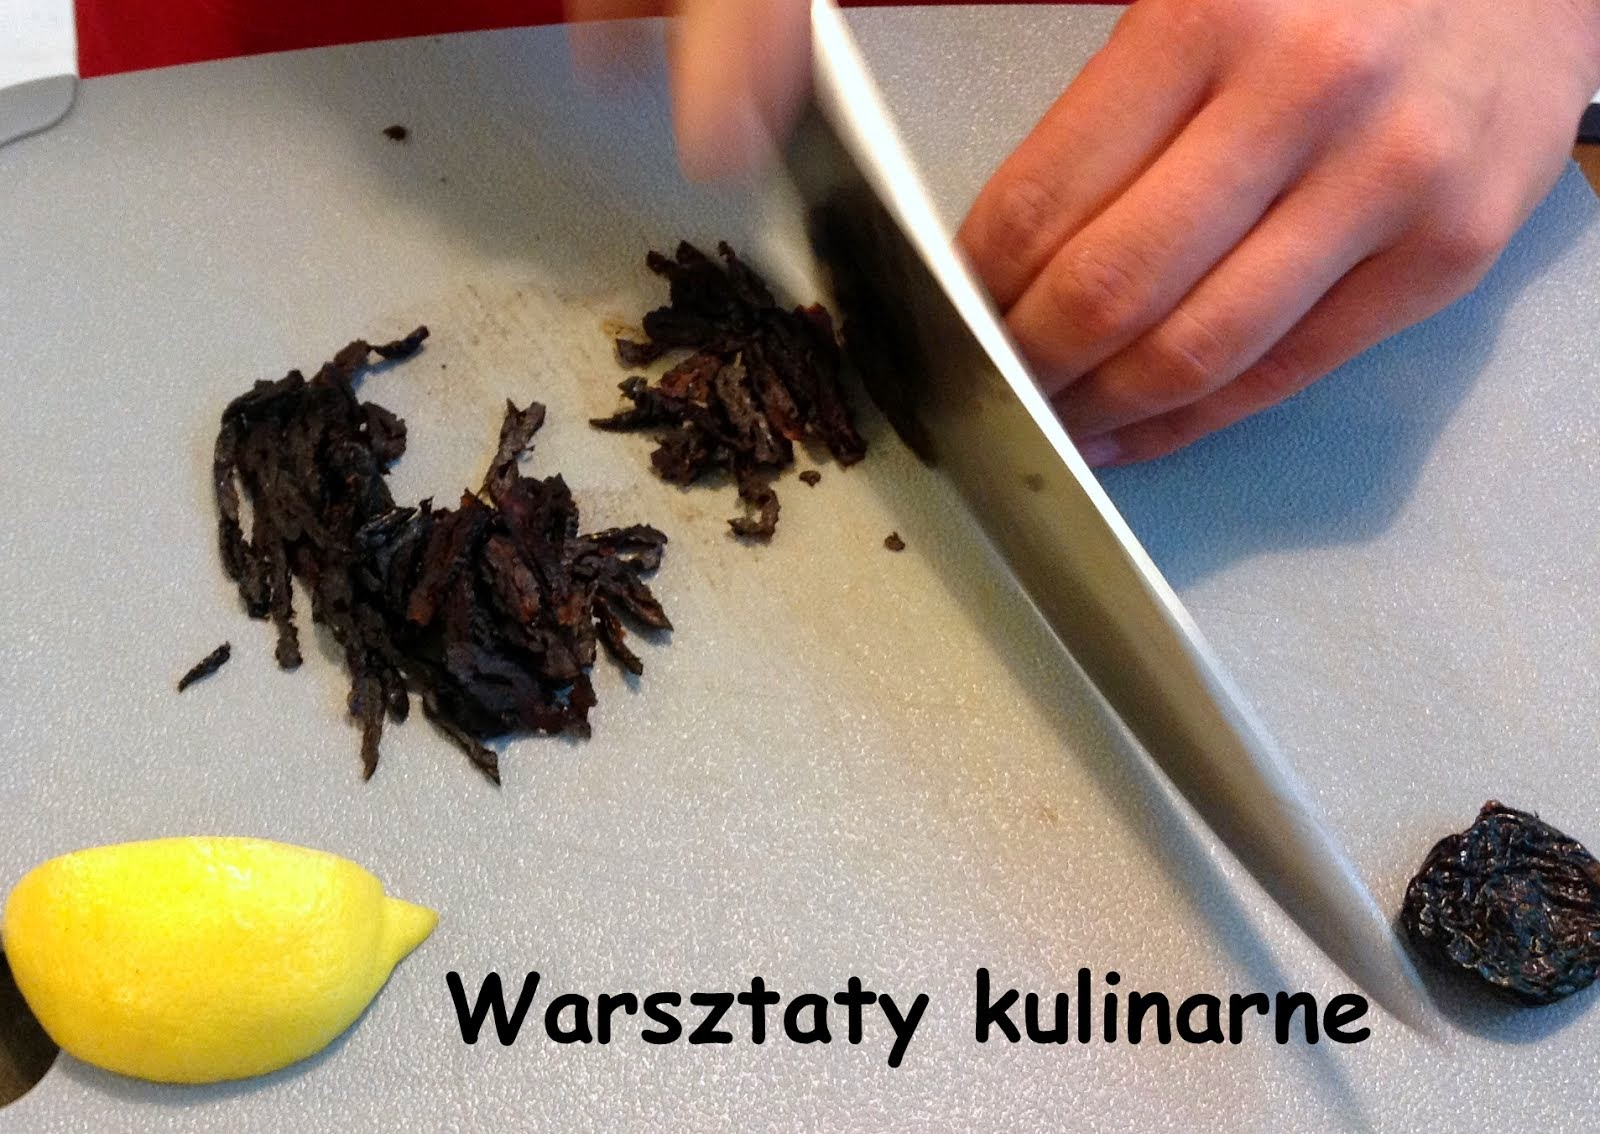 Warszaty kulinarne